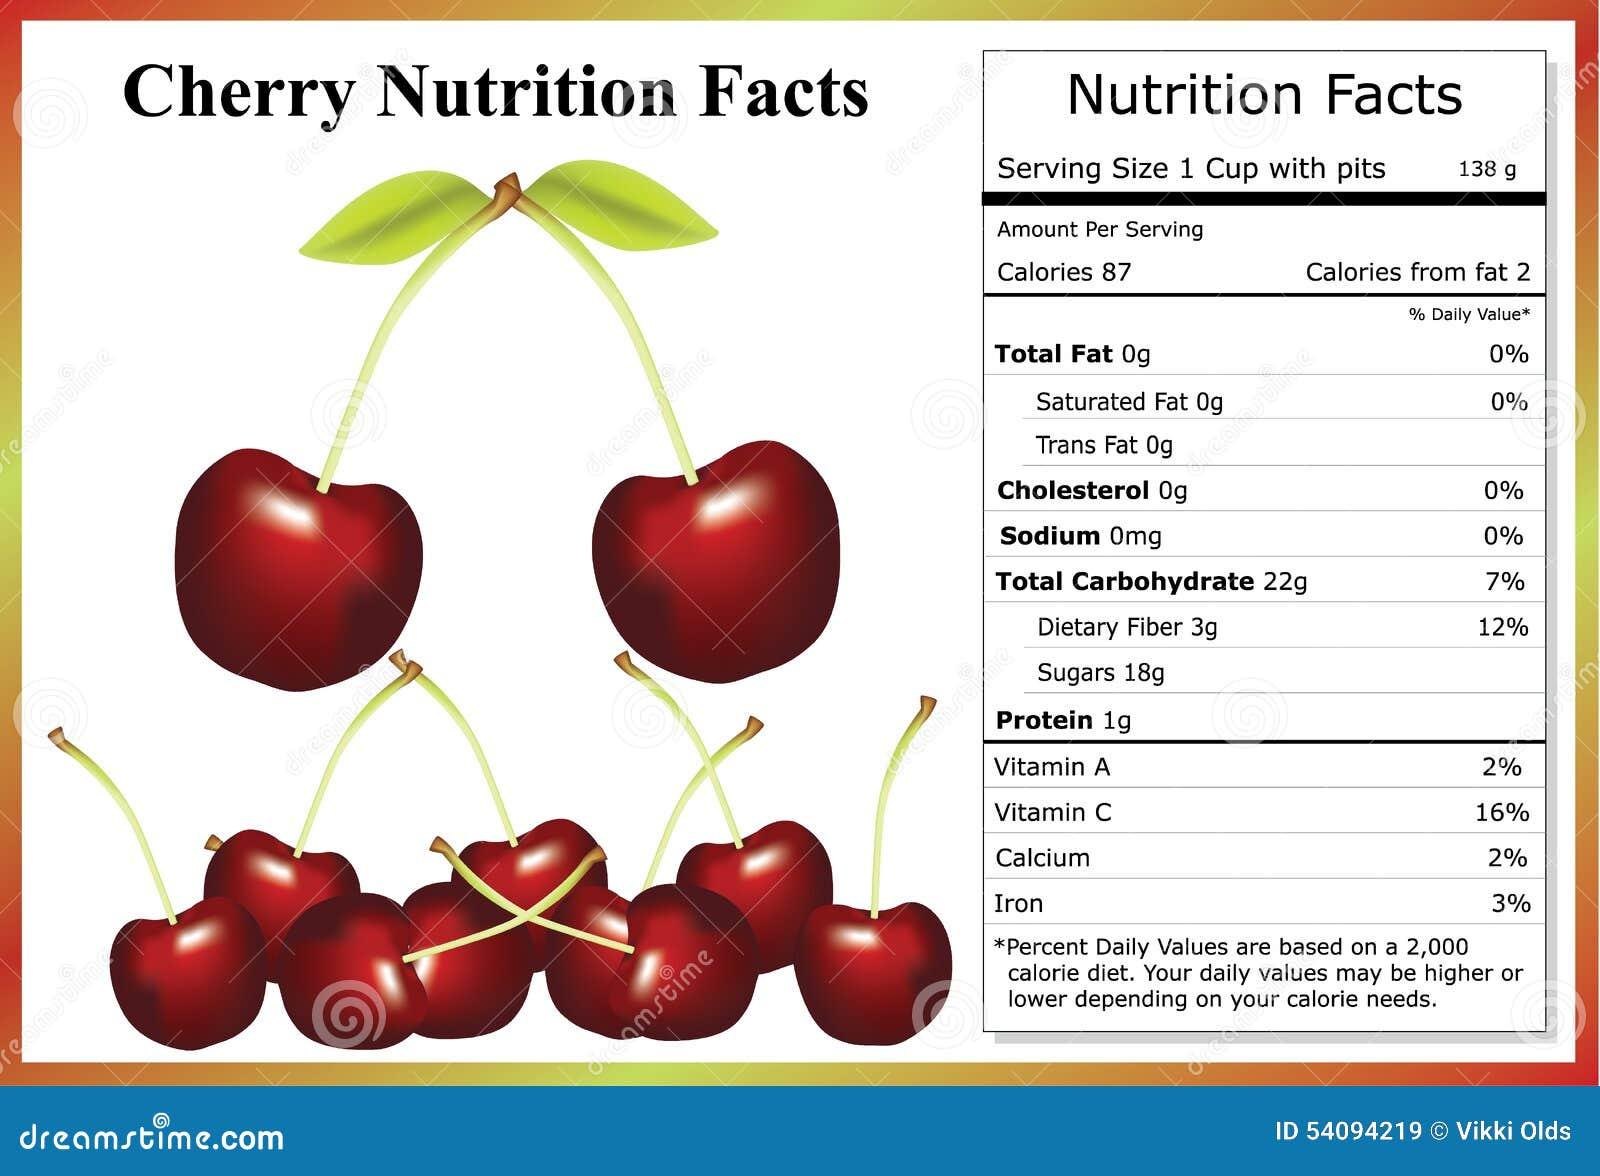 Vitamins in cherry fruit